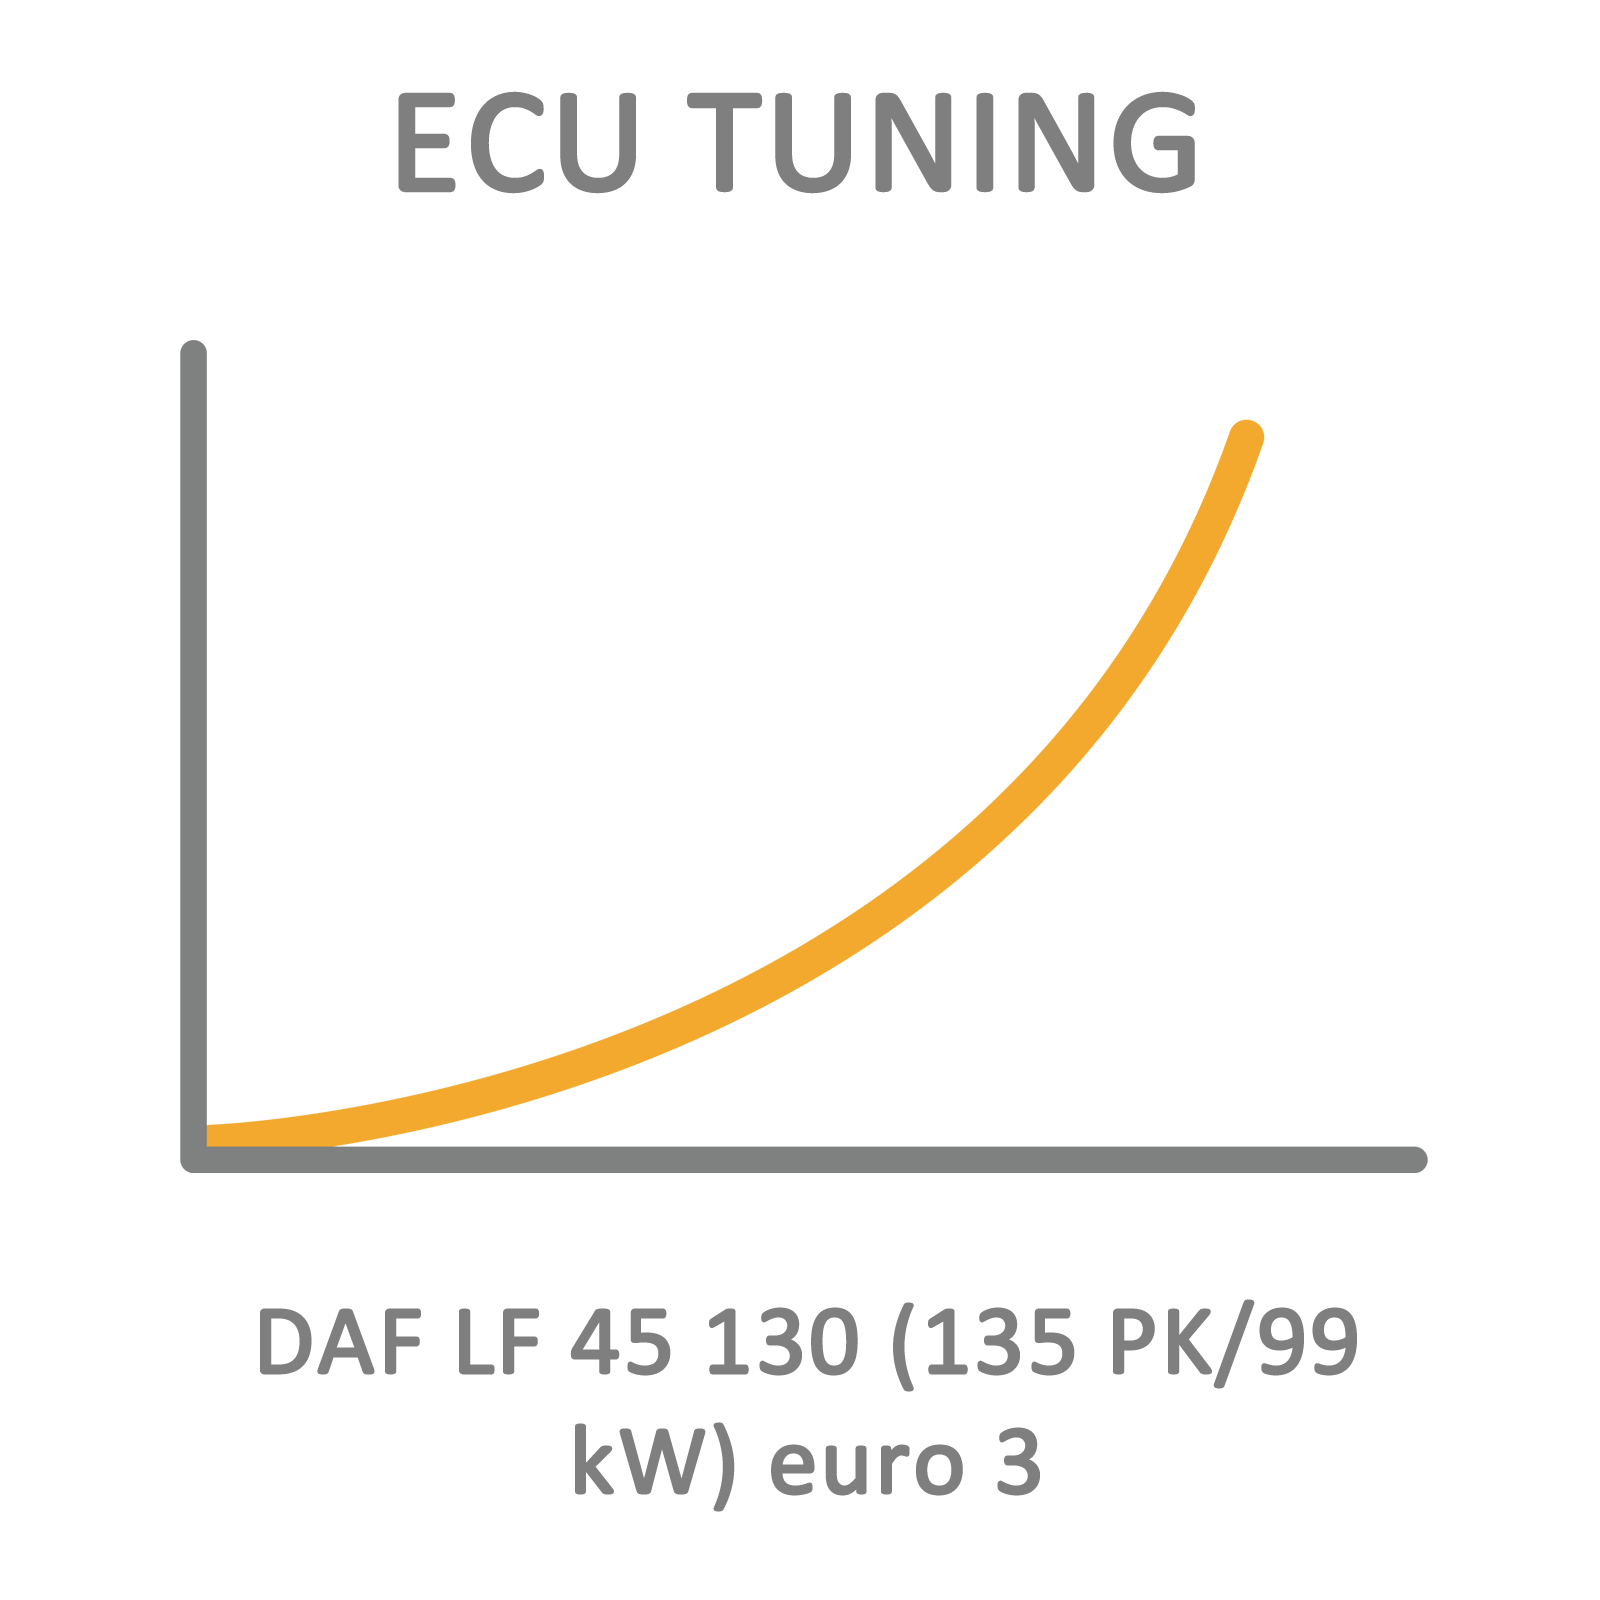 DAF LF 45 130 (135 PK/99 kW) euro 3 ECU Tuning Remapping